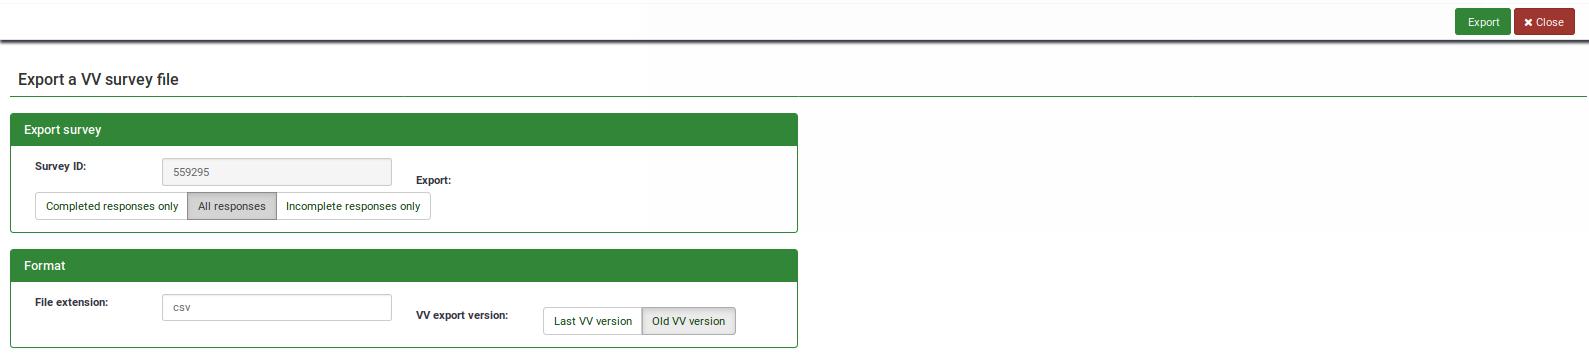 Exporting results - LimeSurvey Manual